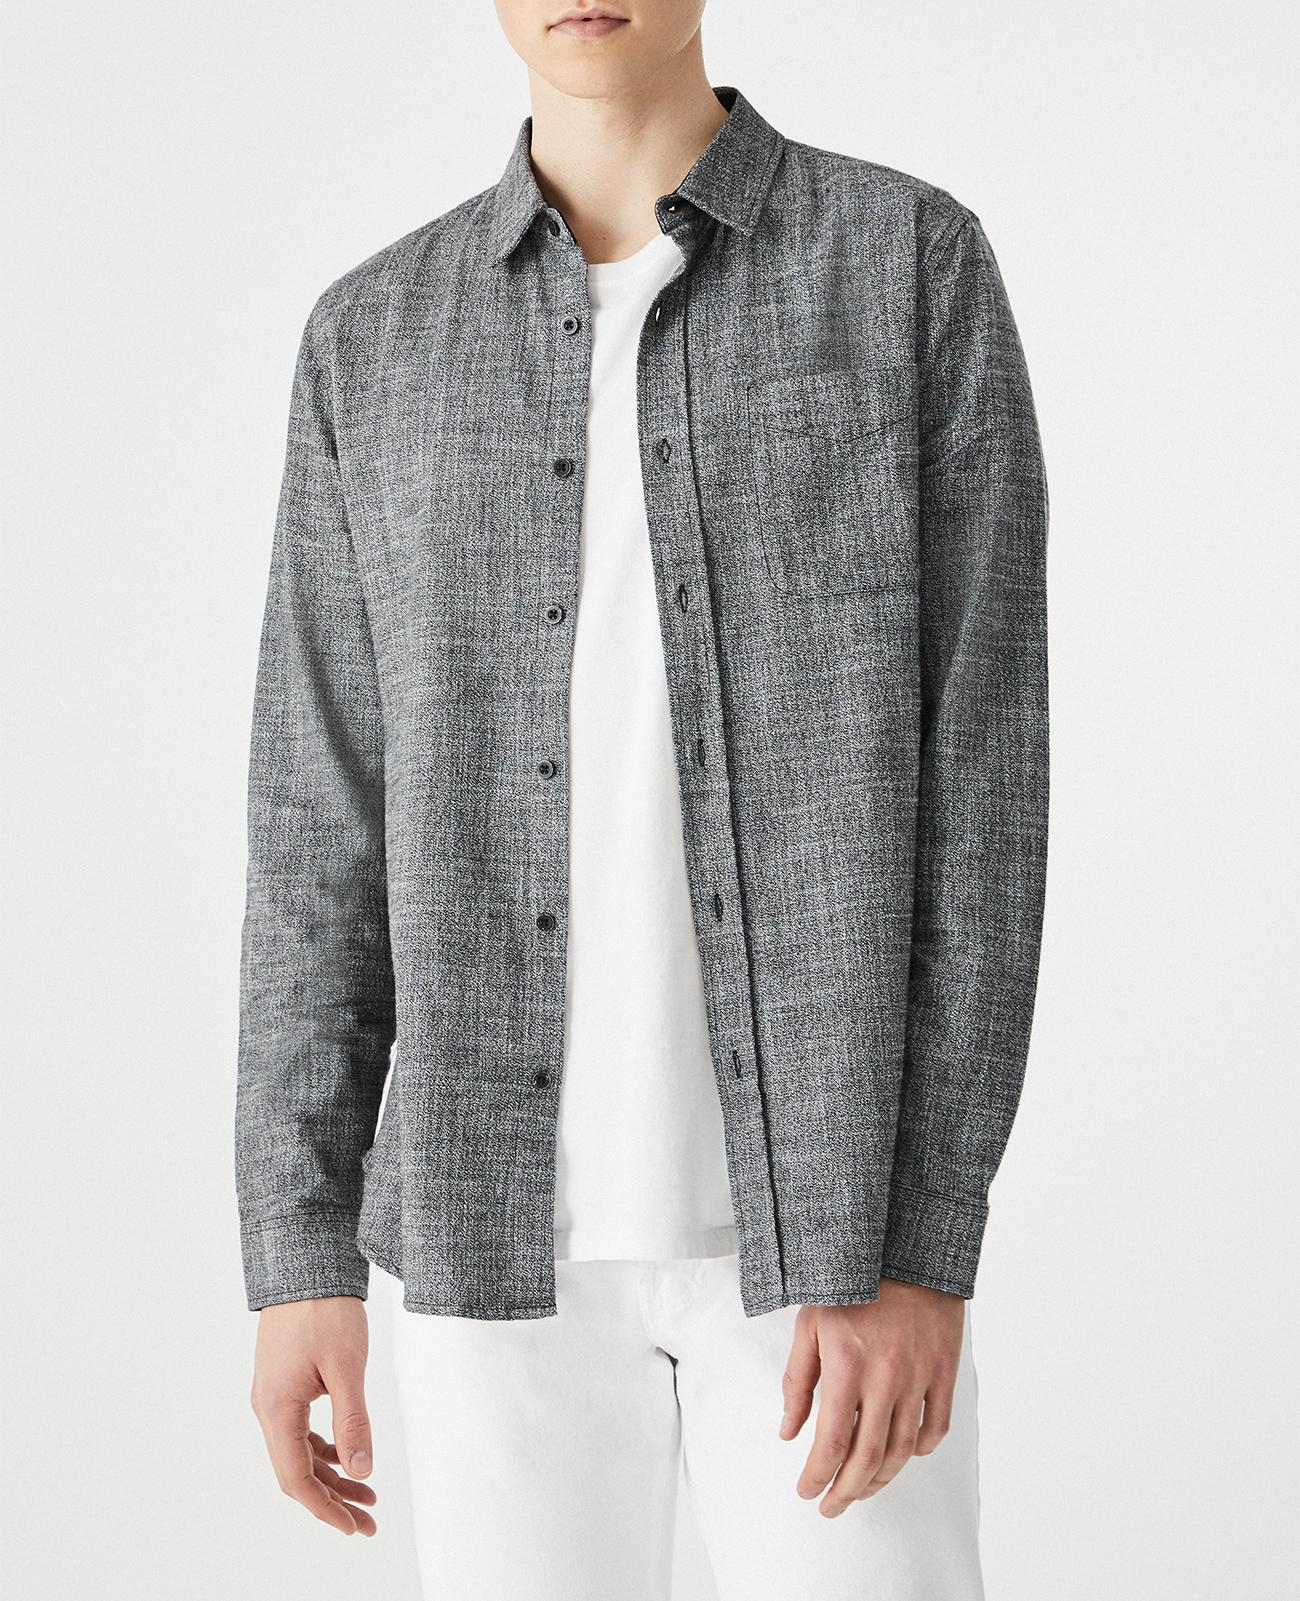 The Colton Shirt